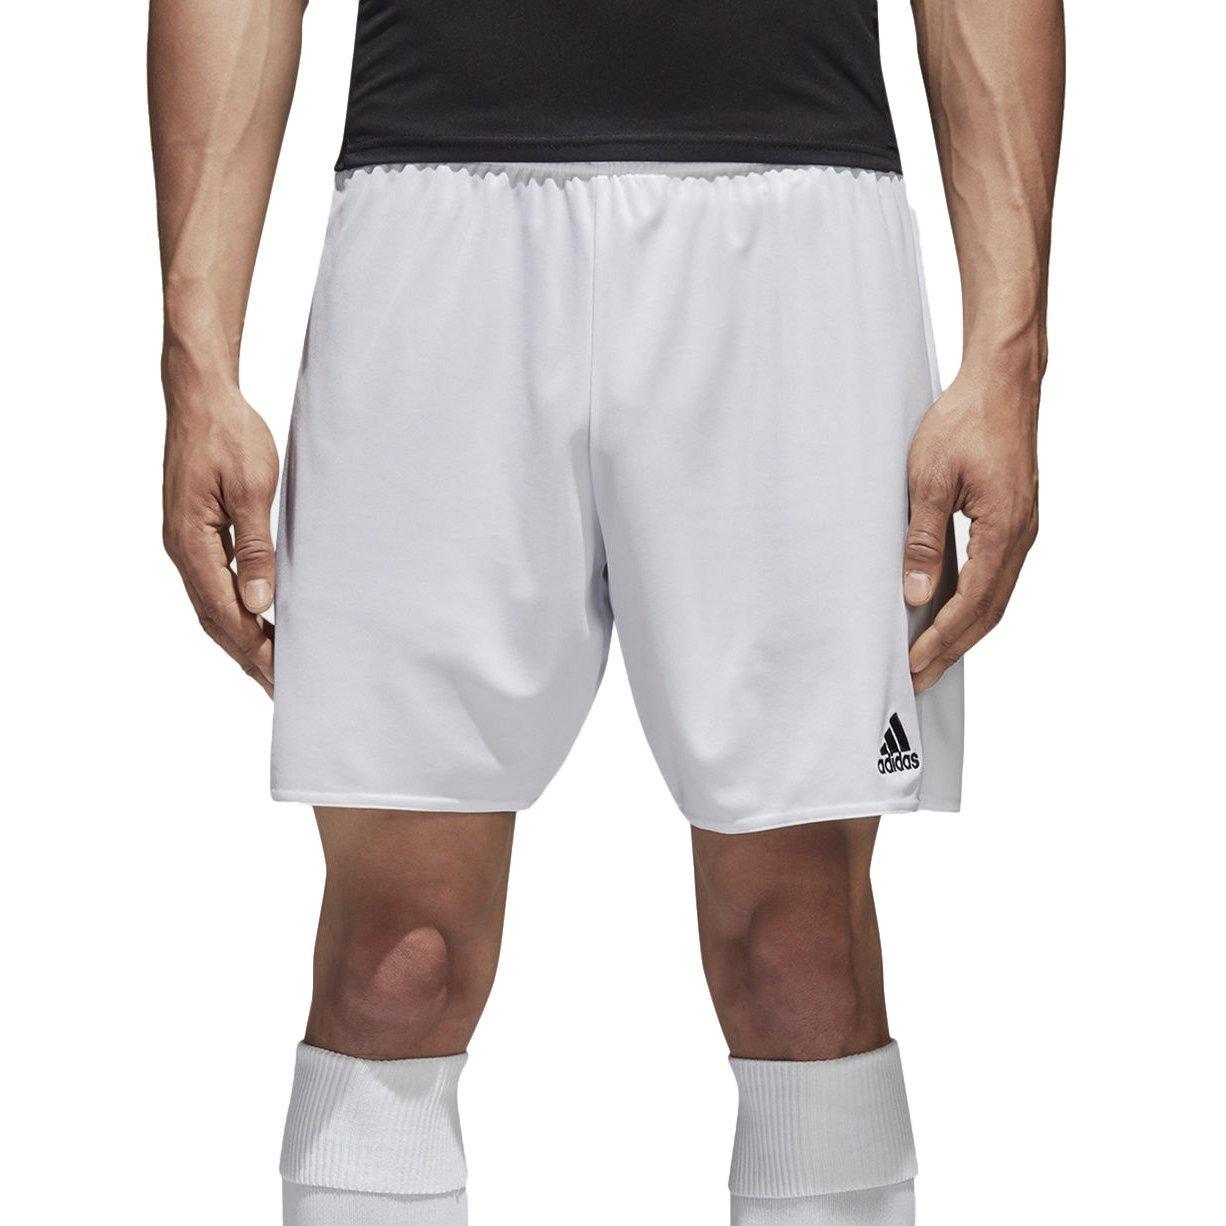 Adidas Parma 16 SHO Pantalones Cortos, Hombre, Blanco (White/Black), XL AC5254-164